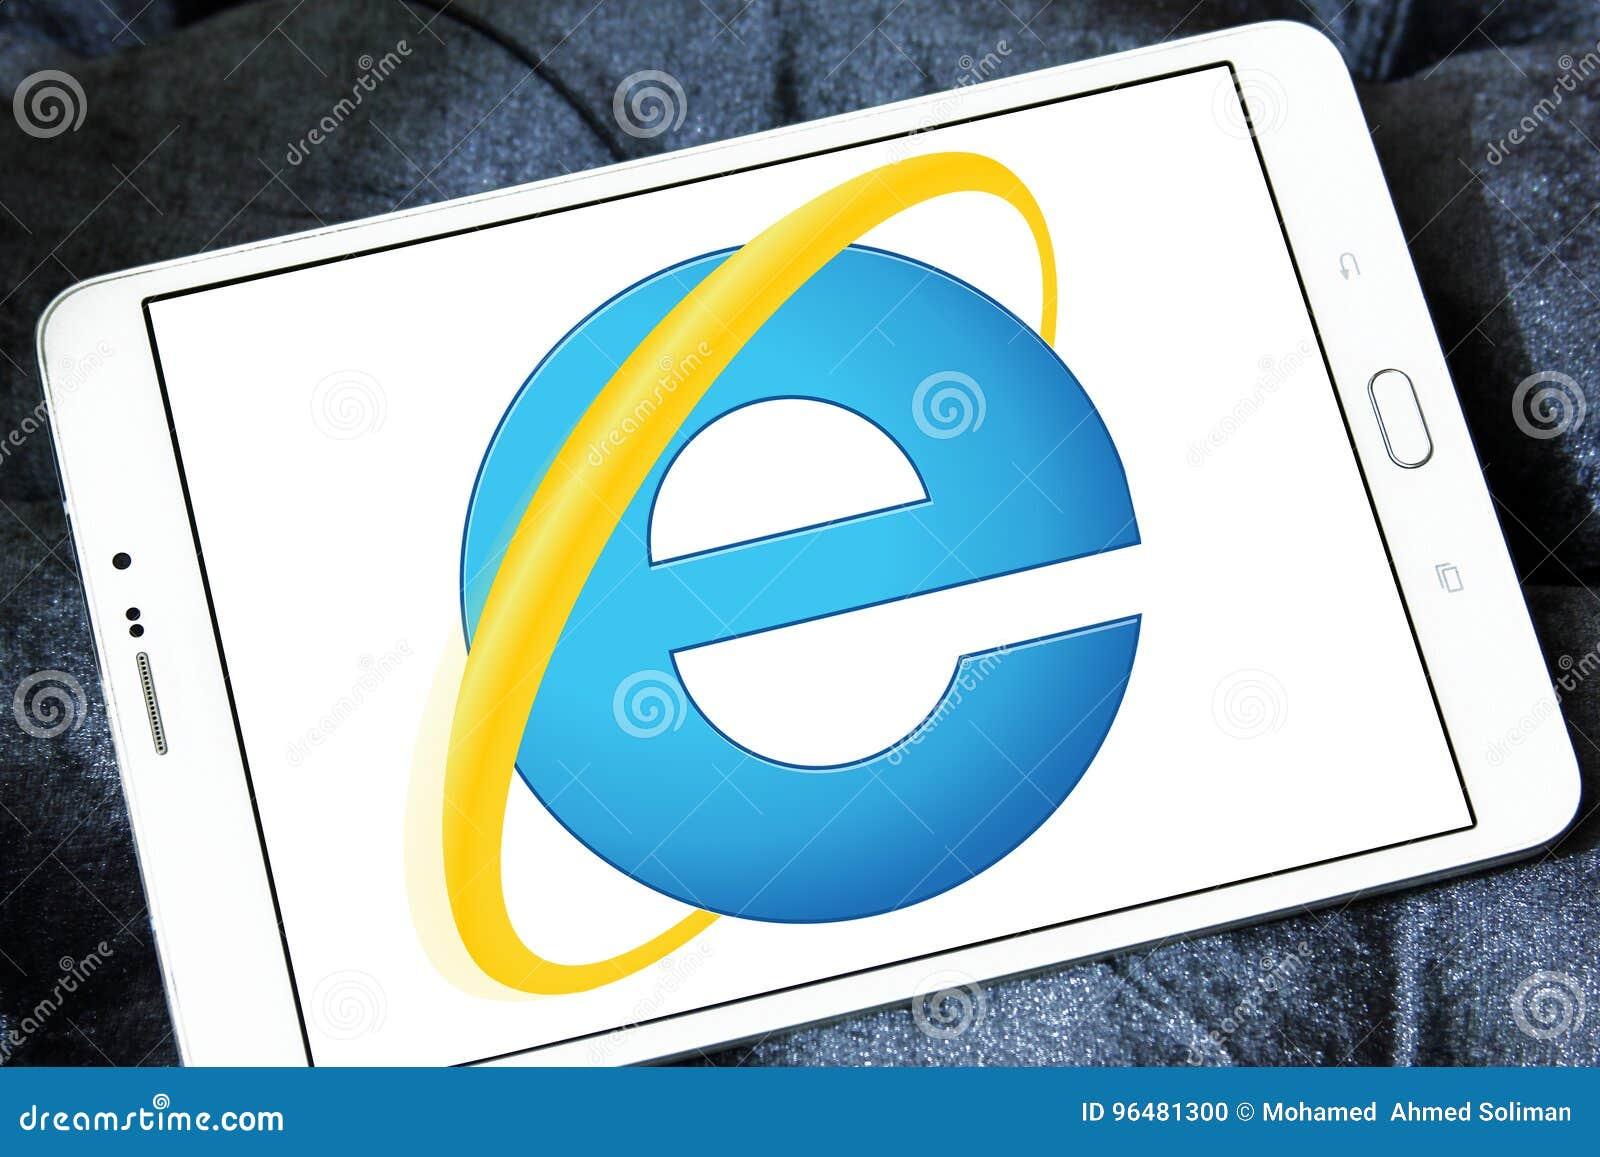 Internet explorer web browser logo editorial photography image.